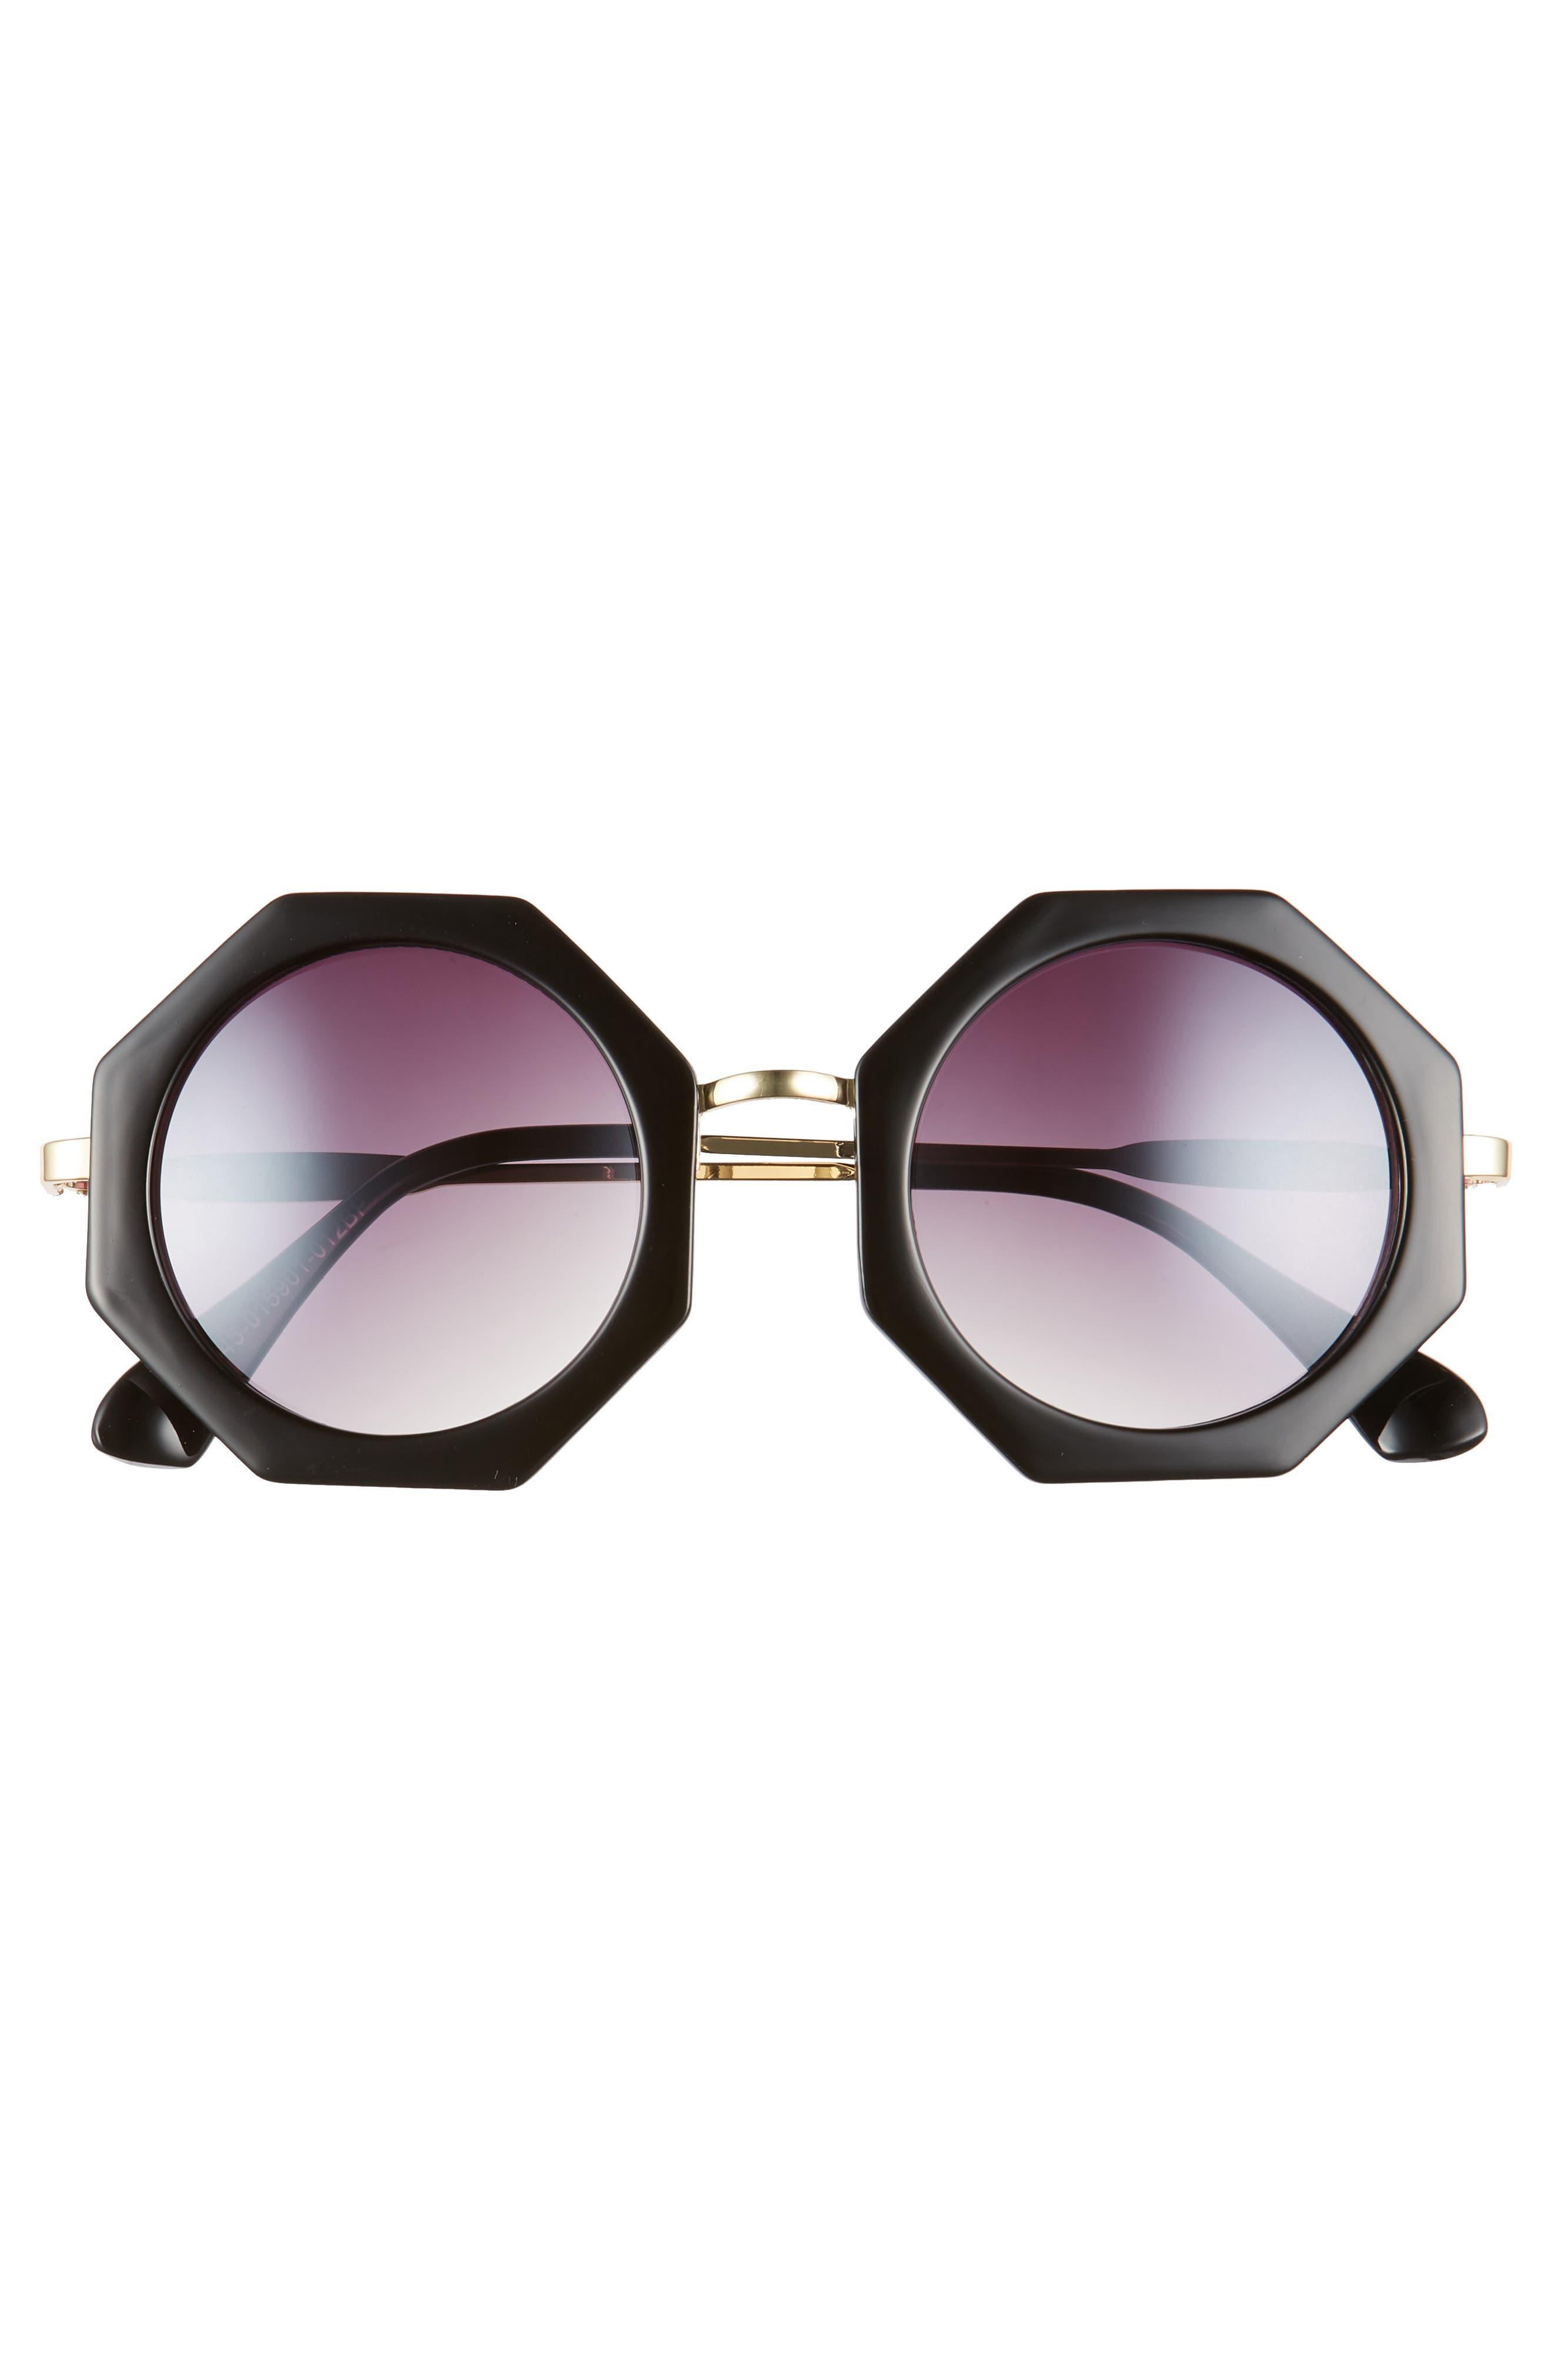 54m Hexagonal Sunglasses,                             Alternate thumbnail 3, color,                             001